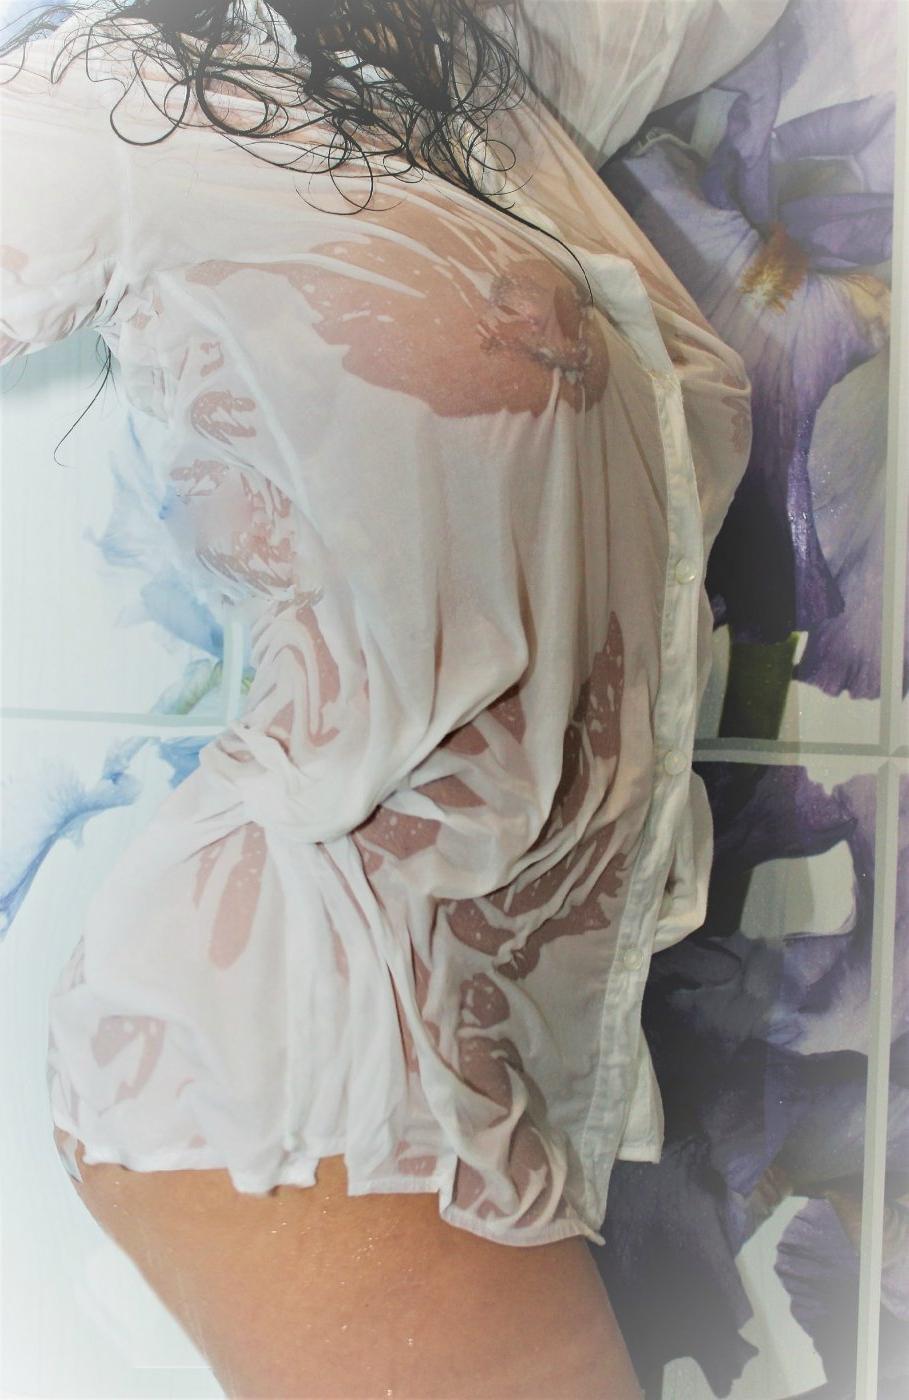 Проститутка Вероника Армей, 32 года, метро Парк культуры